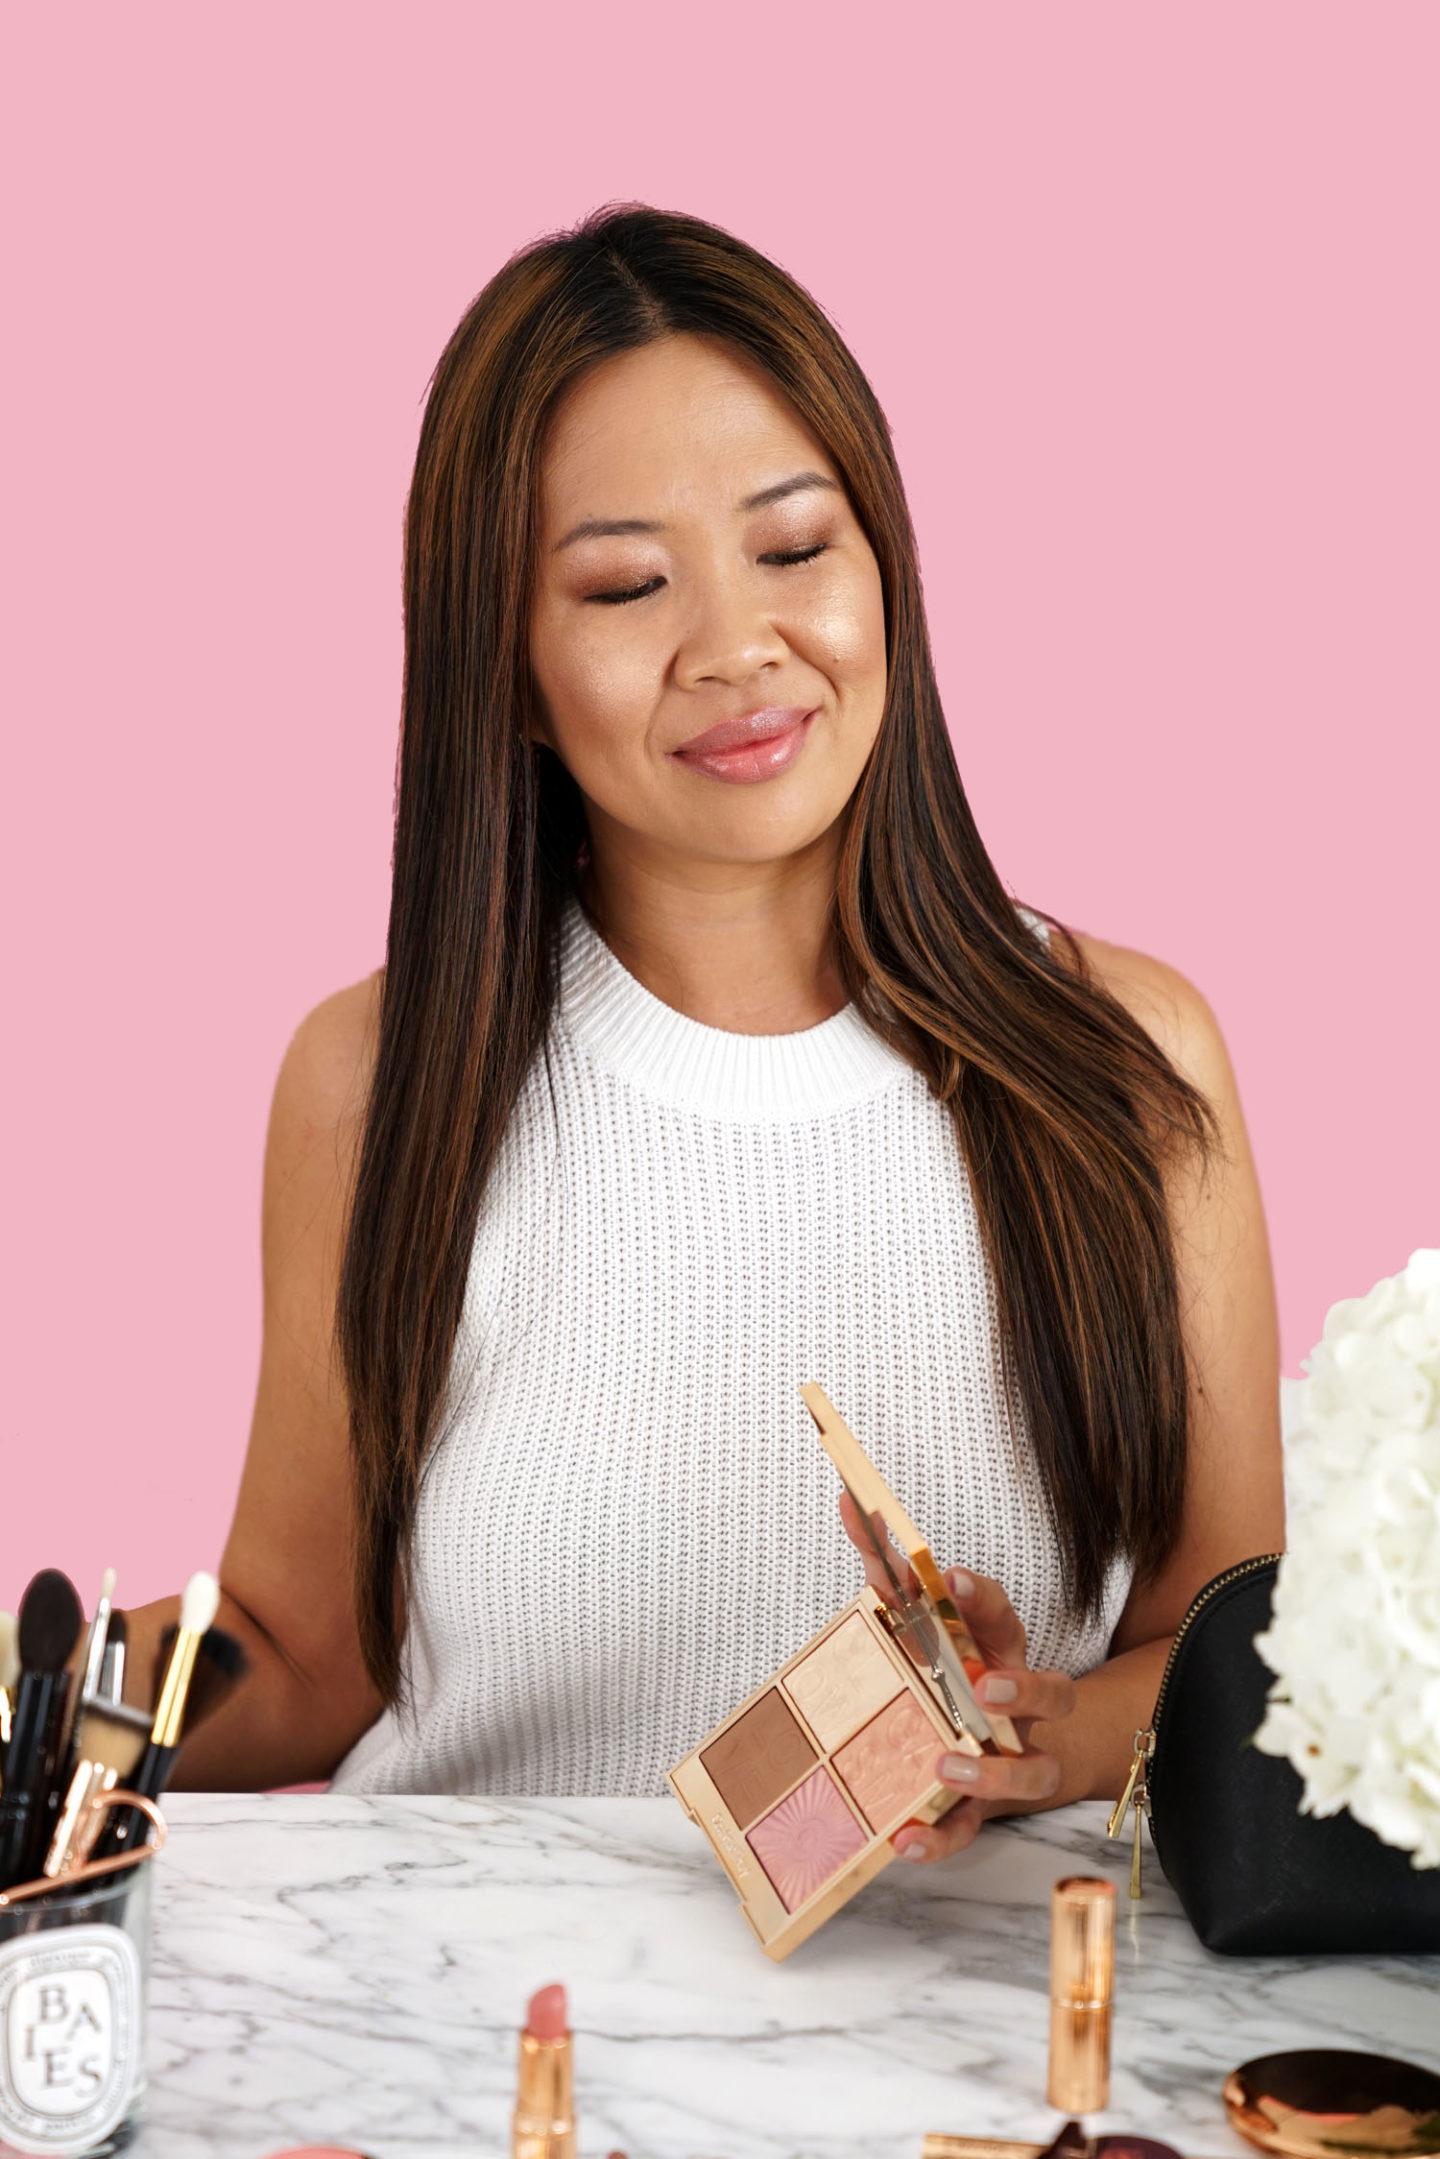 Charlotte Tilbury Effet Maquillage Lightgasm